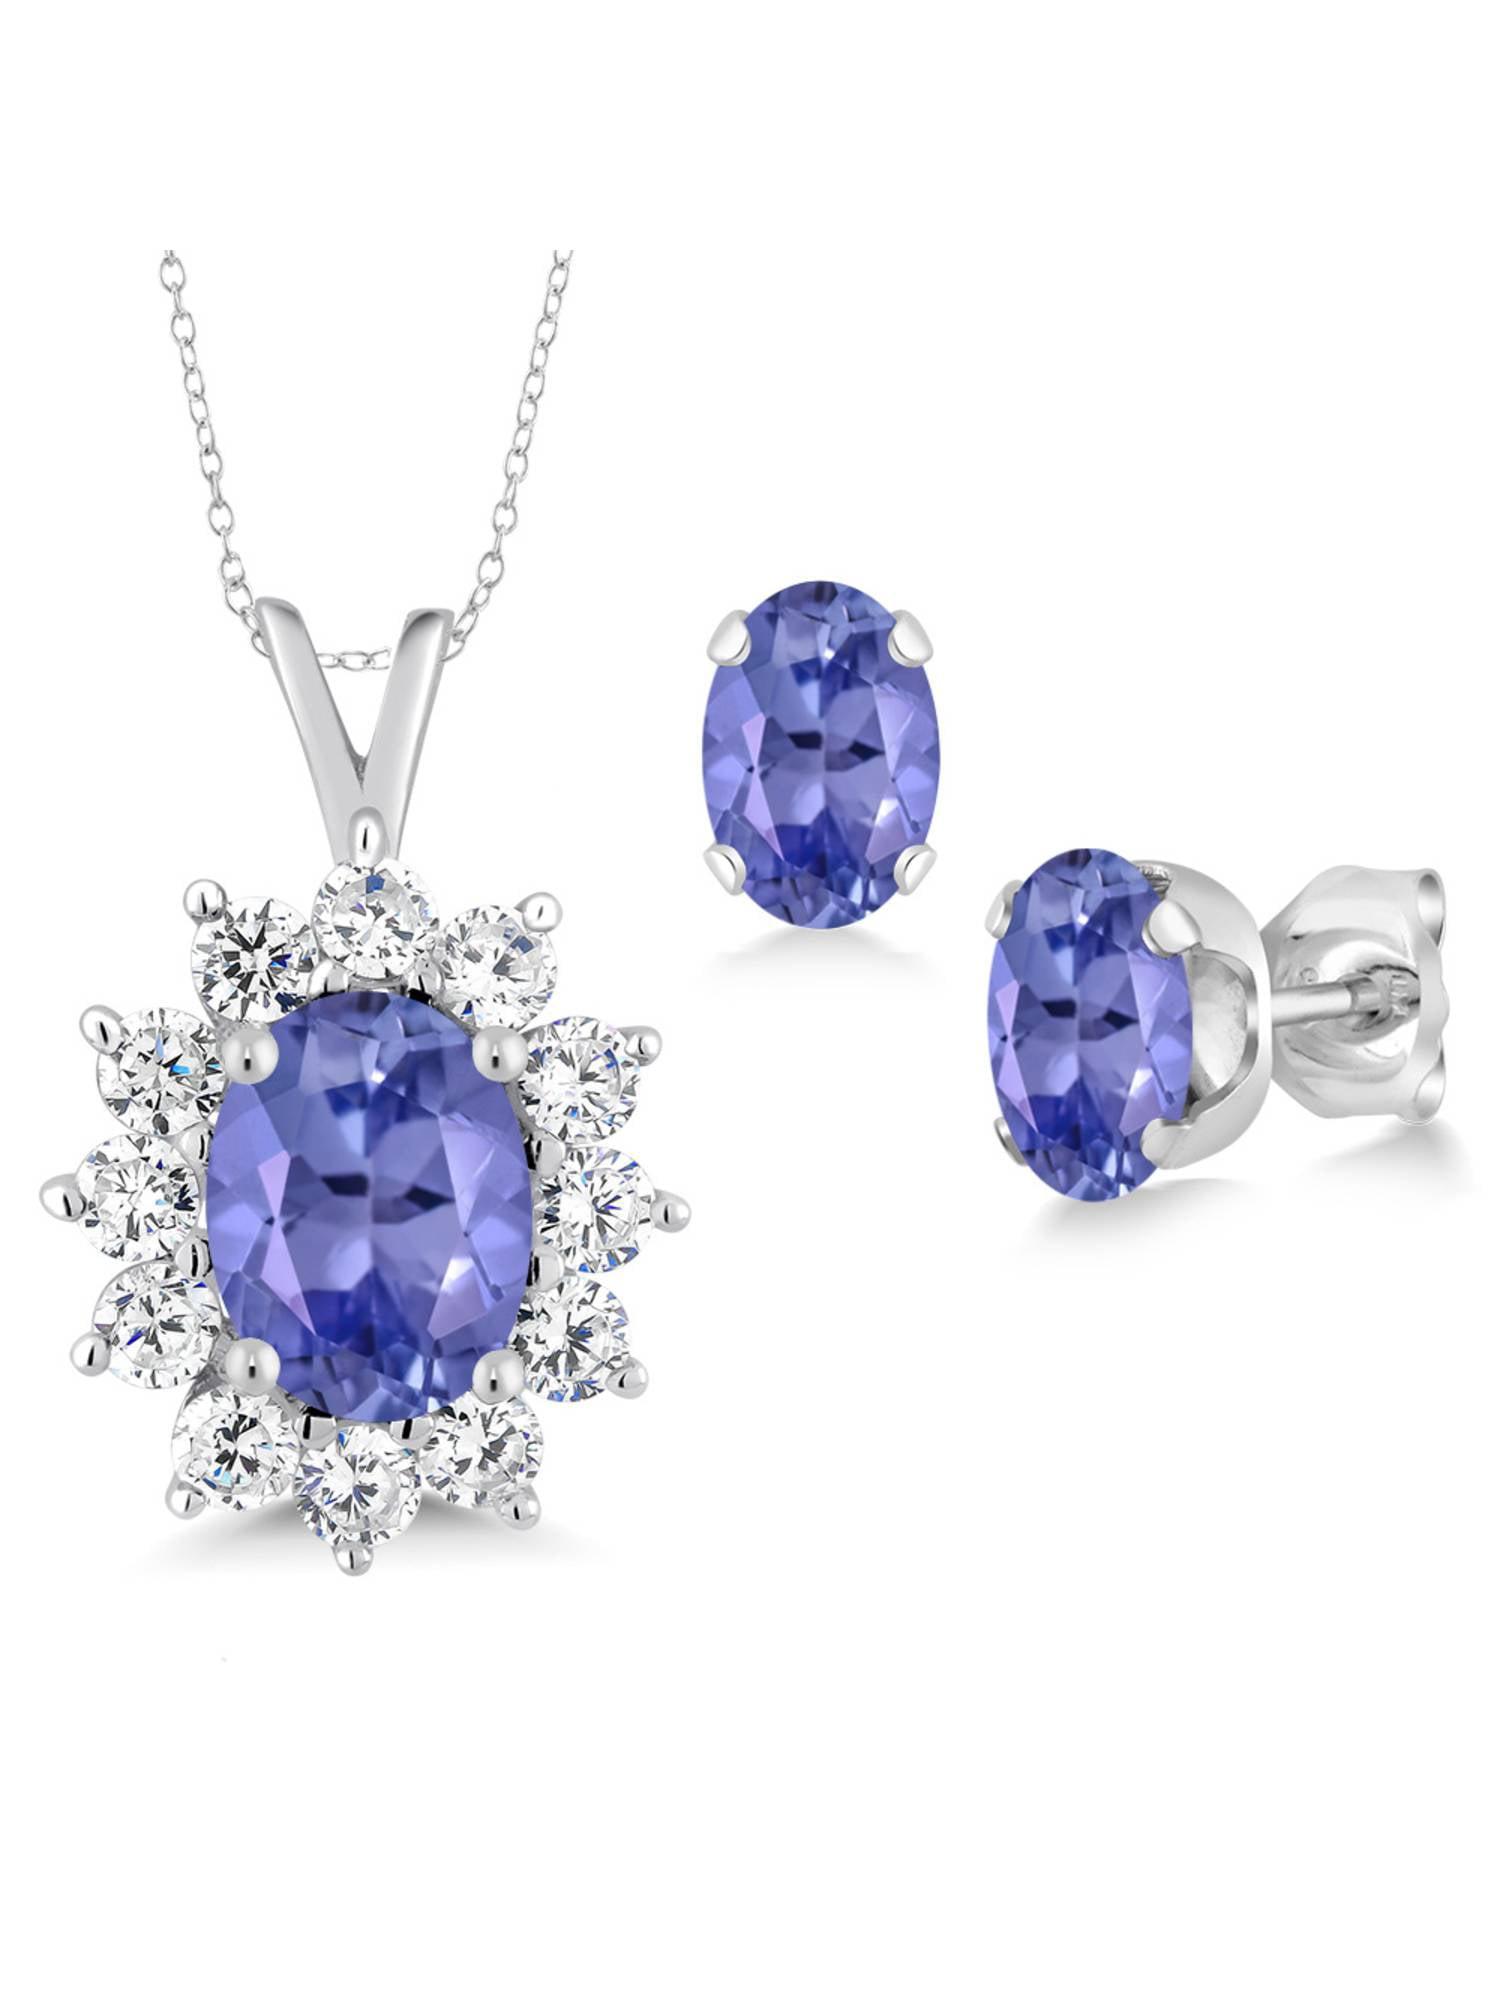 2.30 Ct Oval Blue Tanzanite 925 Sterling Silver Pendant Earrings Set by